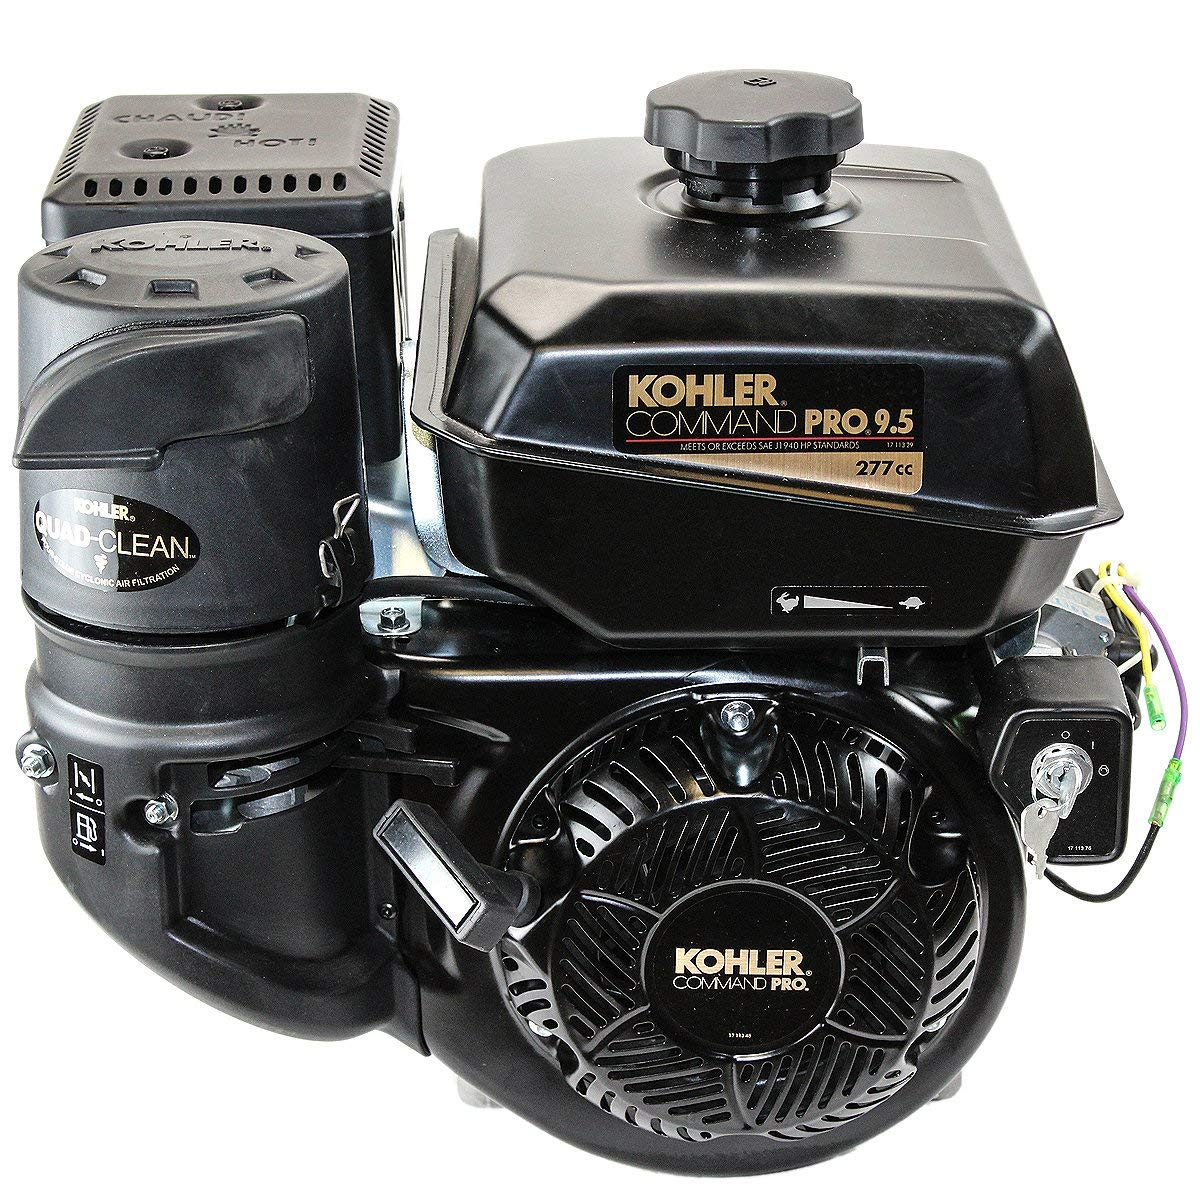 Cheap Kohler Command Pro Engine, find Kohler Command Pro